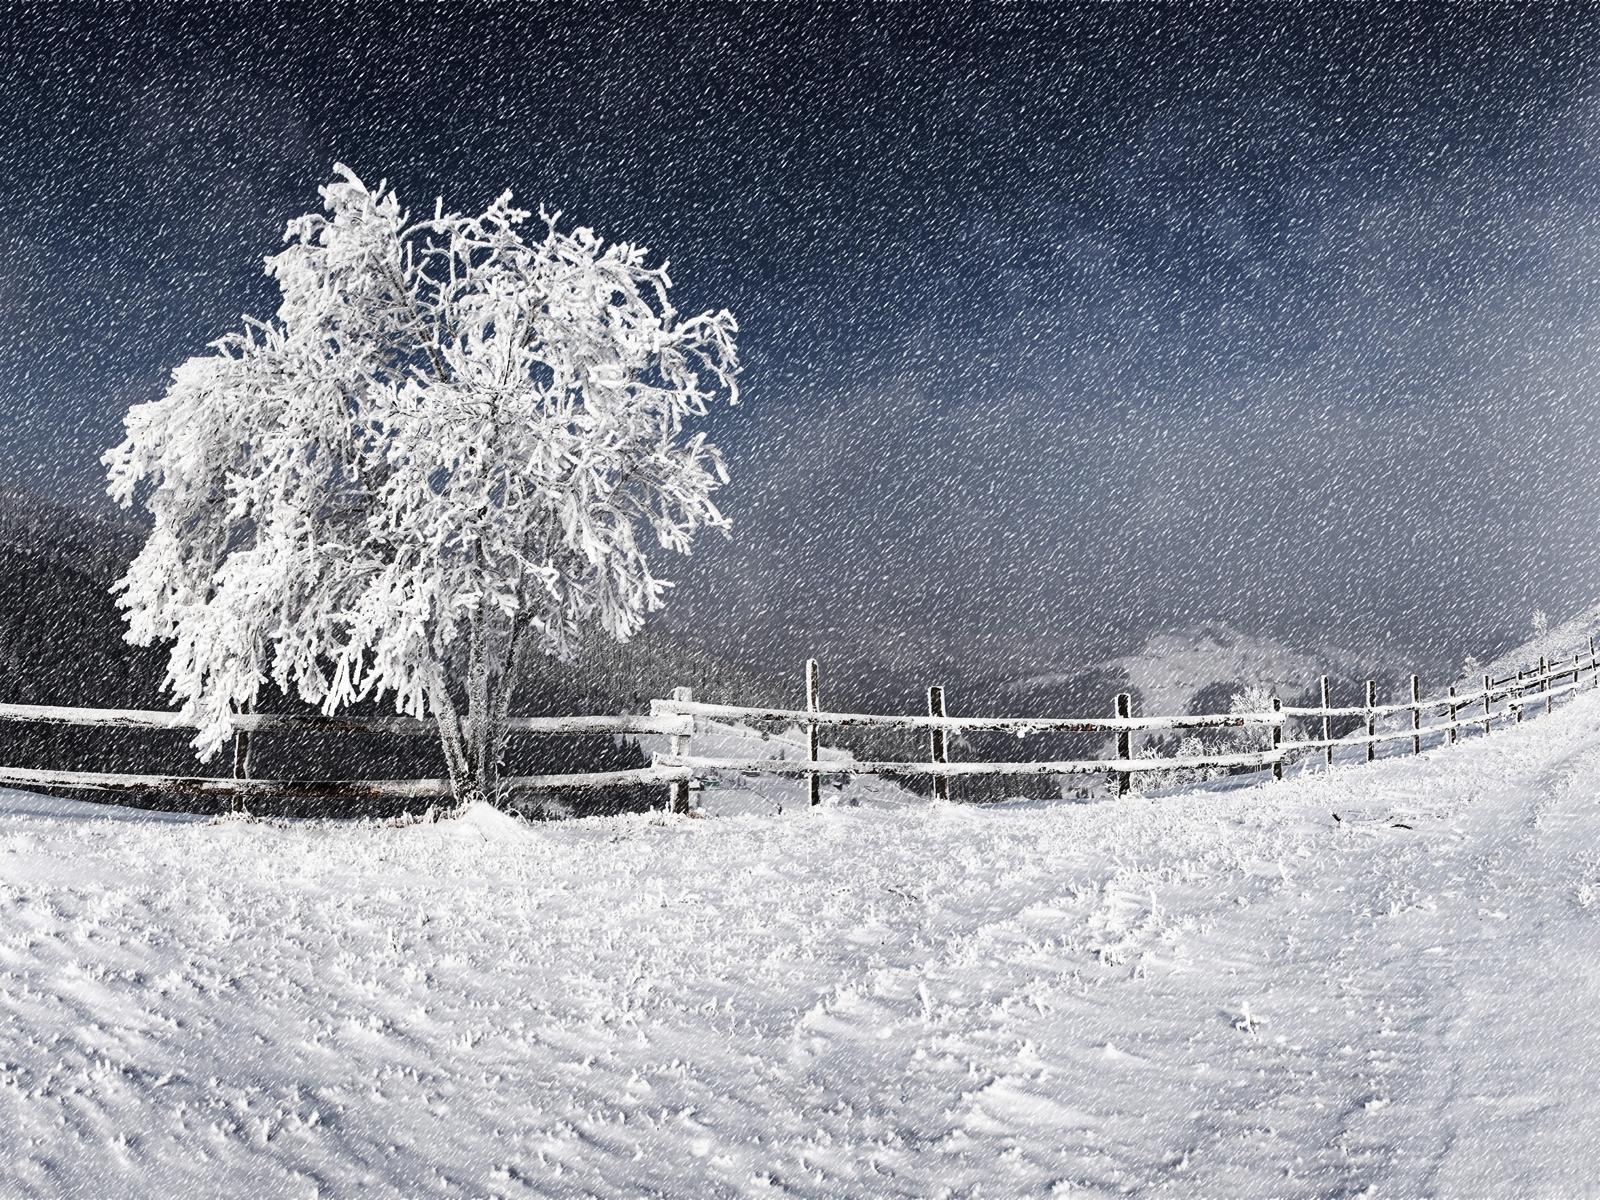 Western Snow Storm Wallpaper Storm Wallpaper Snow Images Snowfall Wallpaper